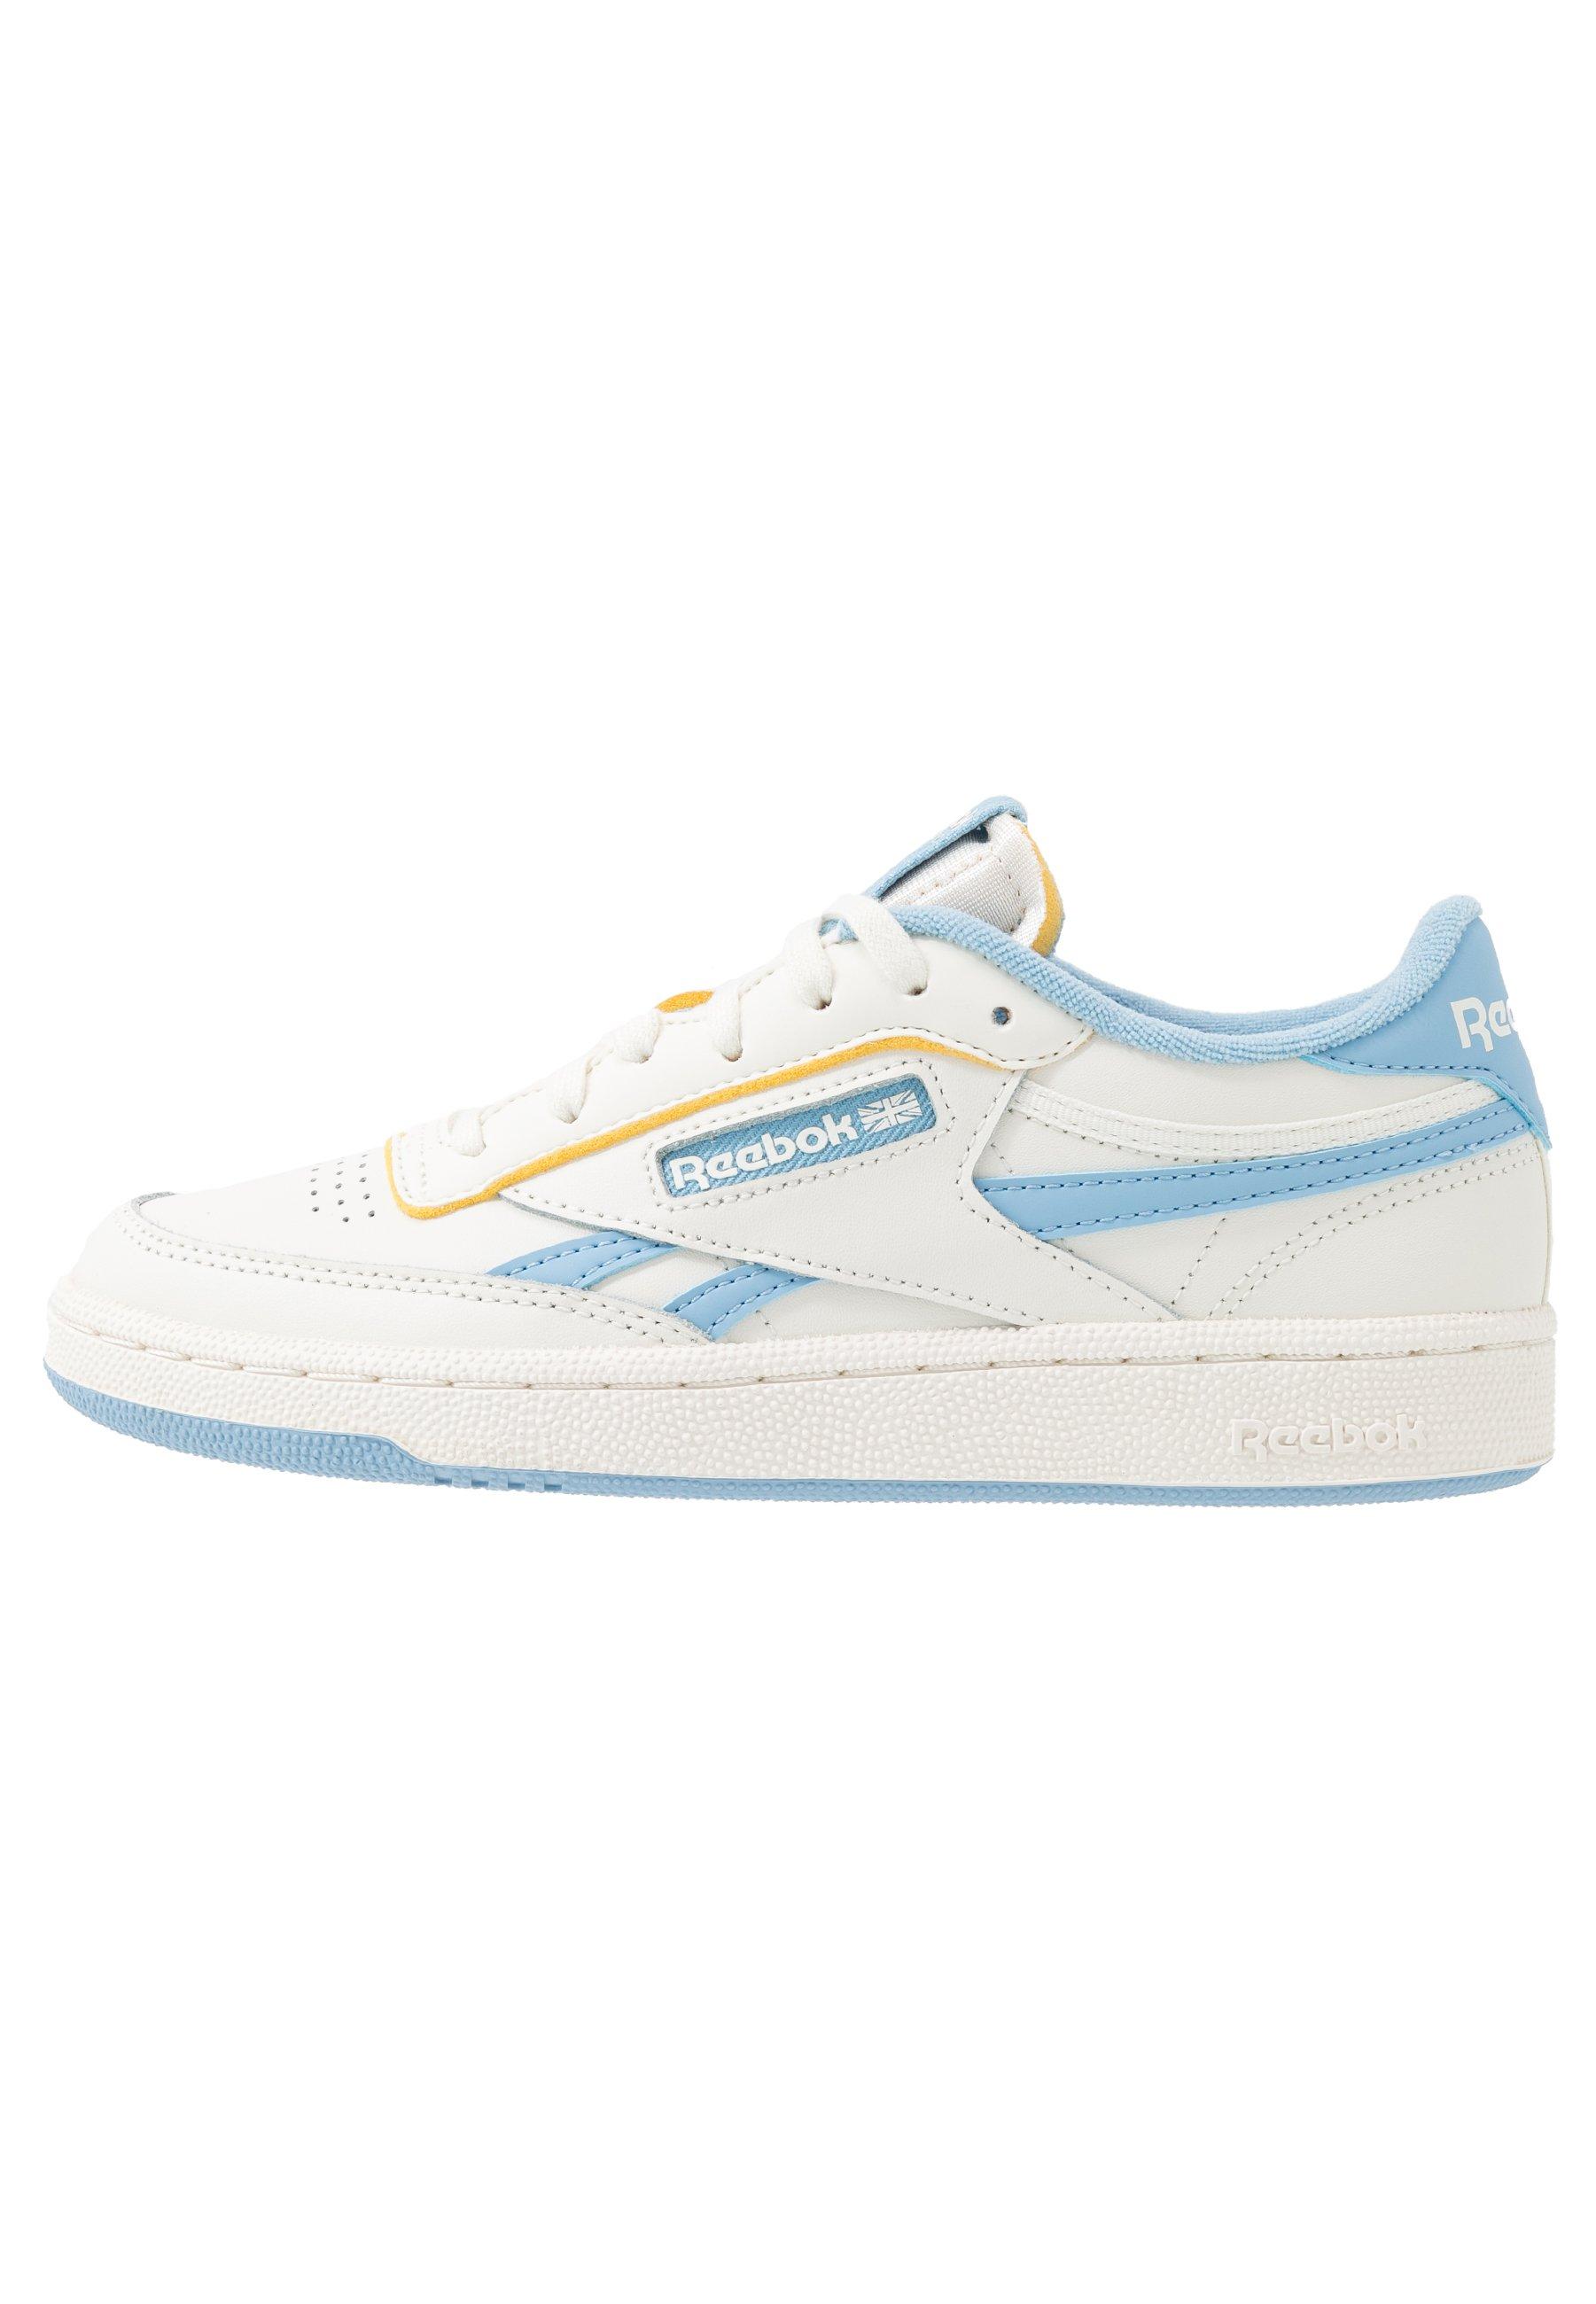 CLUB C REVENGE Sneakers chalkfluid blue